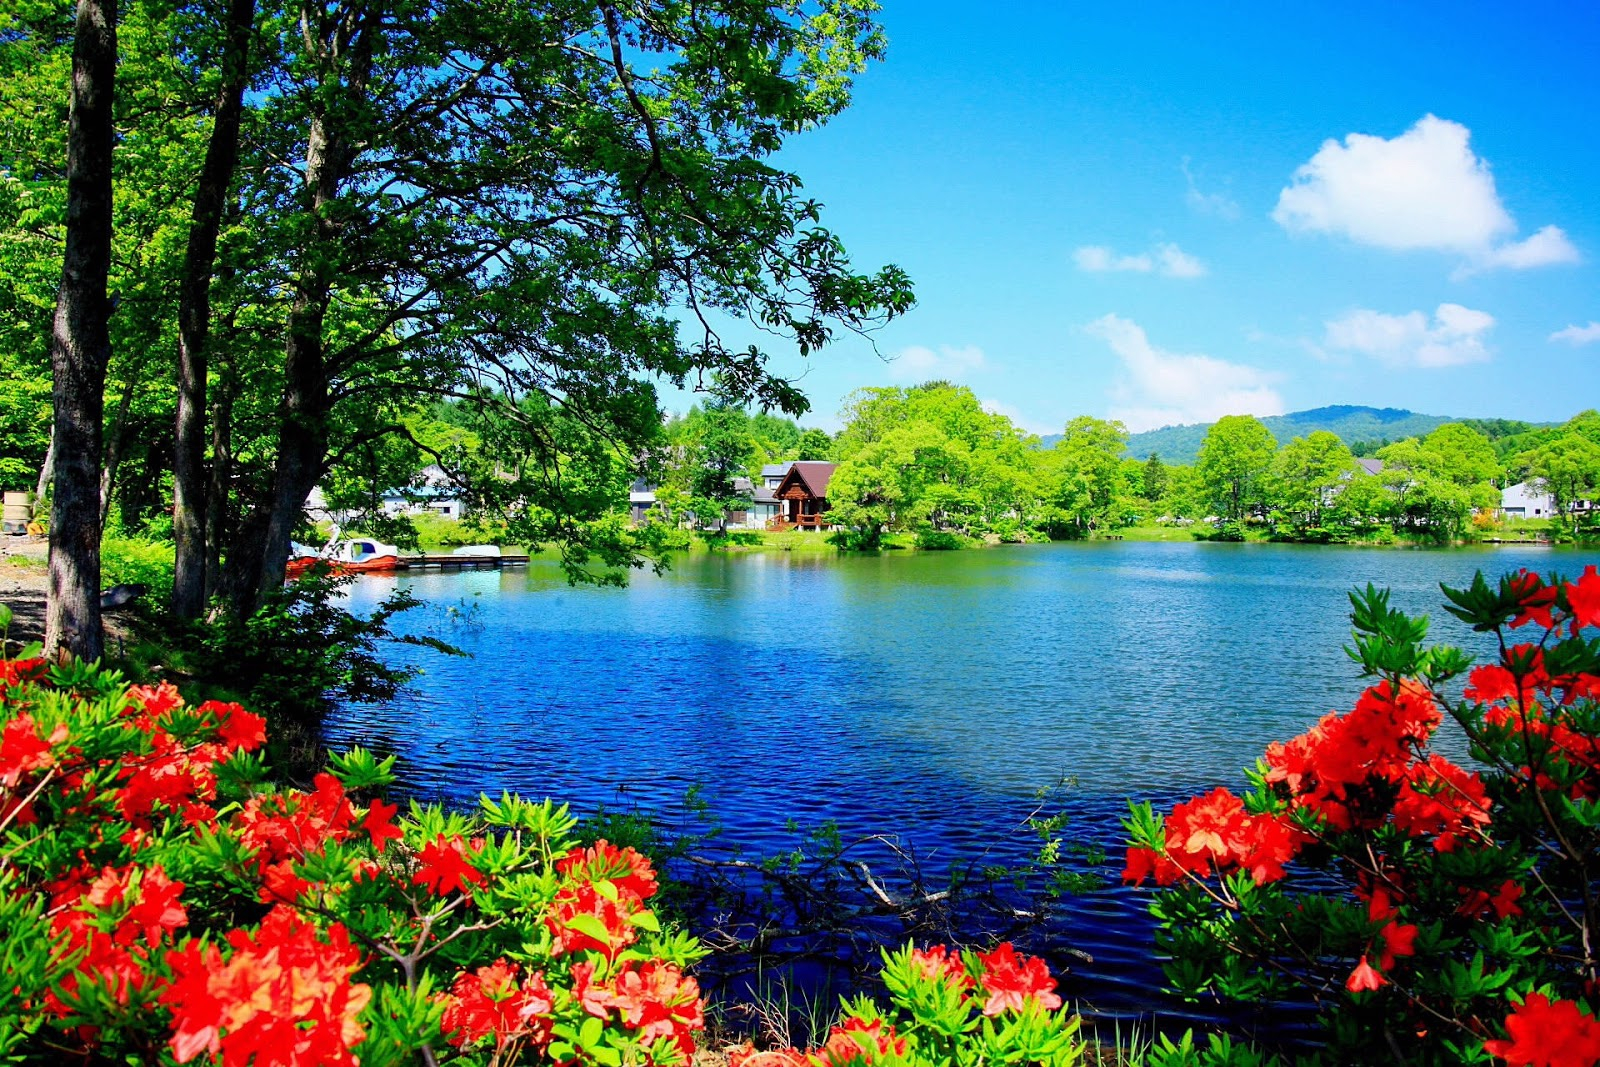 http://1.bp.blogspot.com/-jBpGD-Zy8Jk/Uu_xHvnnYPI/AAAAAAACJ7s/kT8RQI4RVbU/s1600/lago-de-agua-azul-clima-tropical-casas-paisajes-hermosos-naturales.jpg